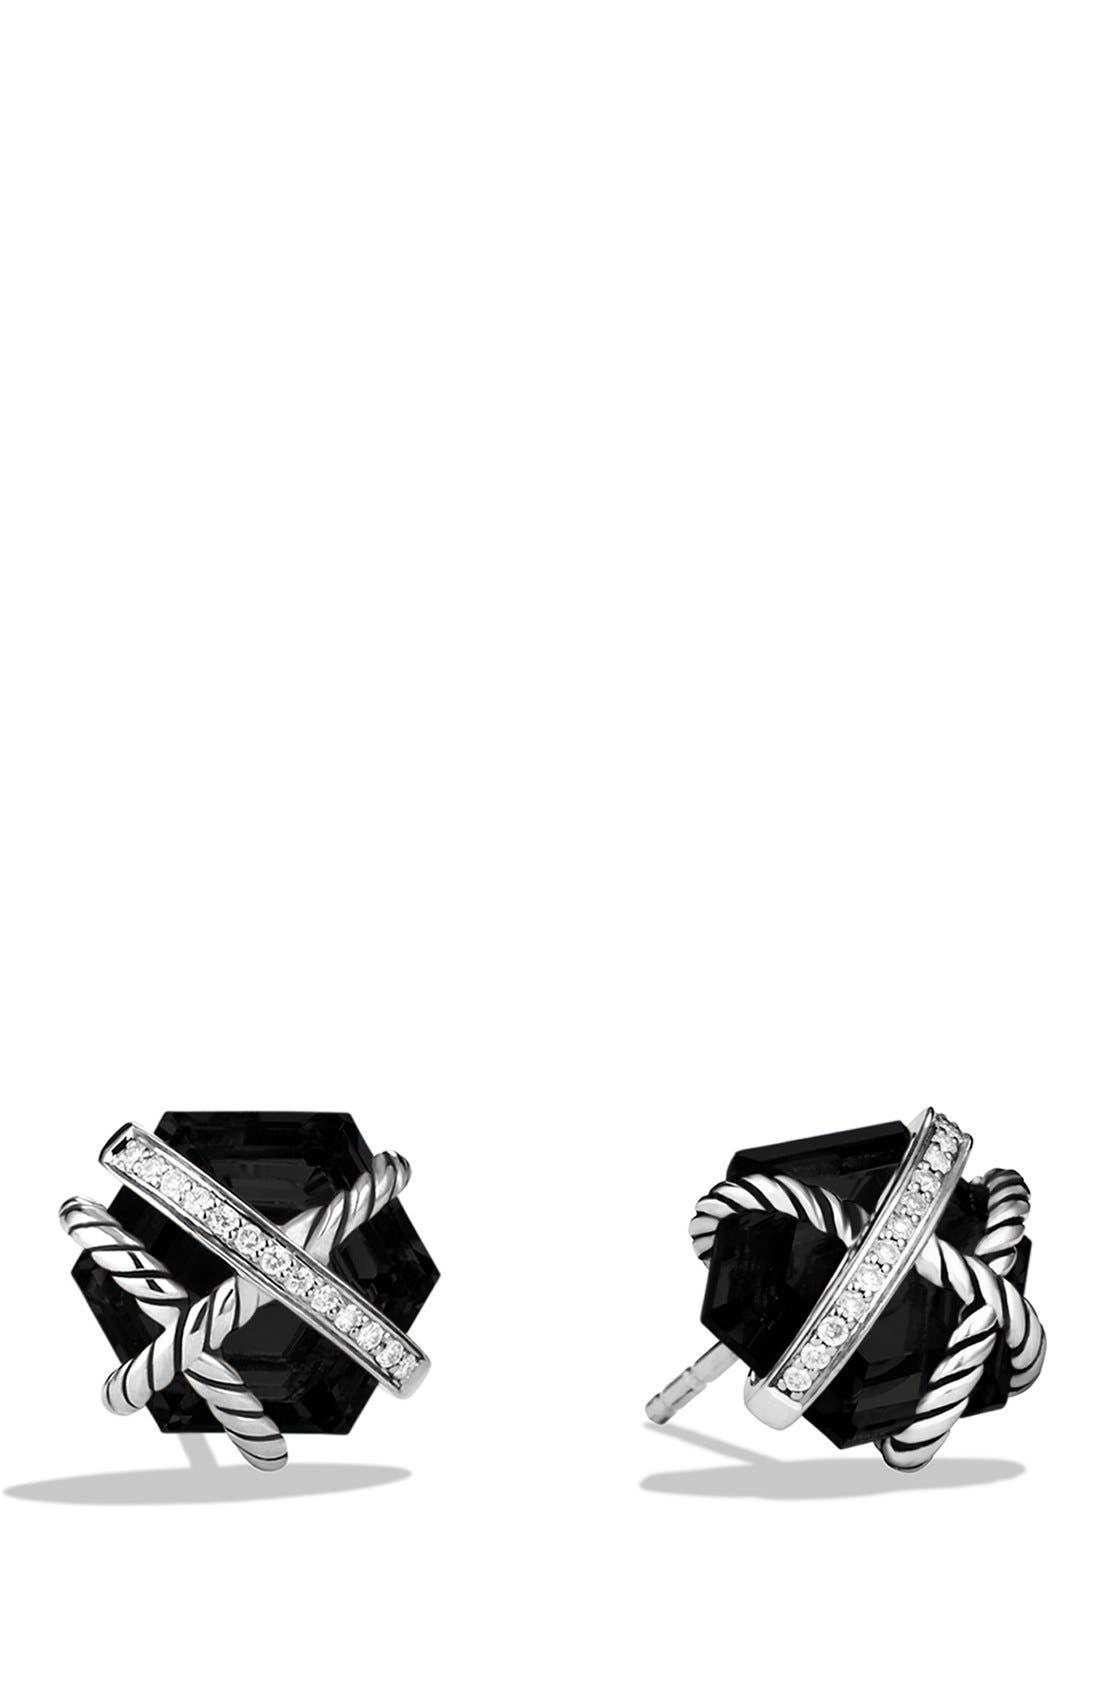 DAVID YURMAN 'Cable Wrap' Earrings with Semiprecious Stones & Diamonds, Main, color, BLACK ONYX